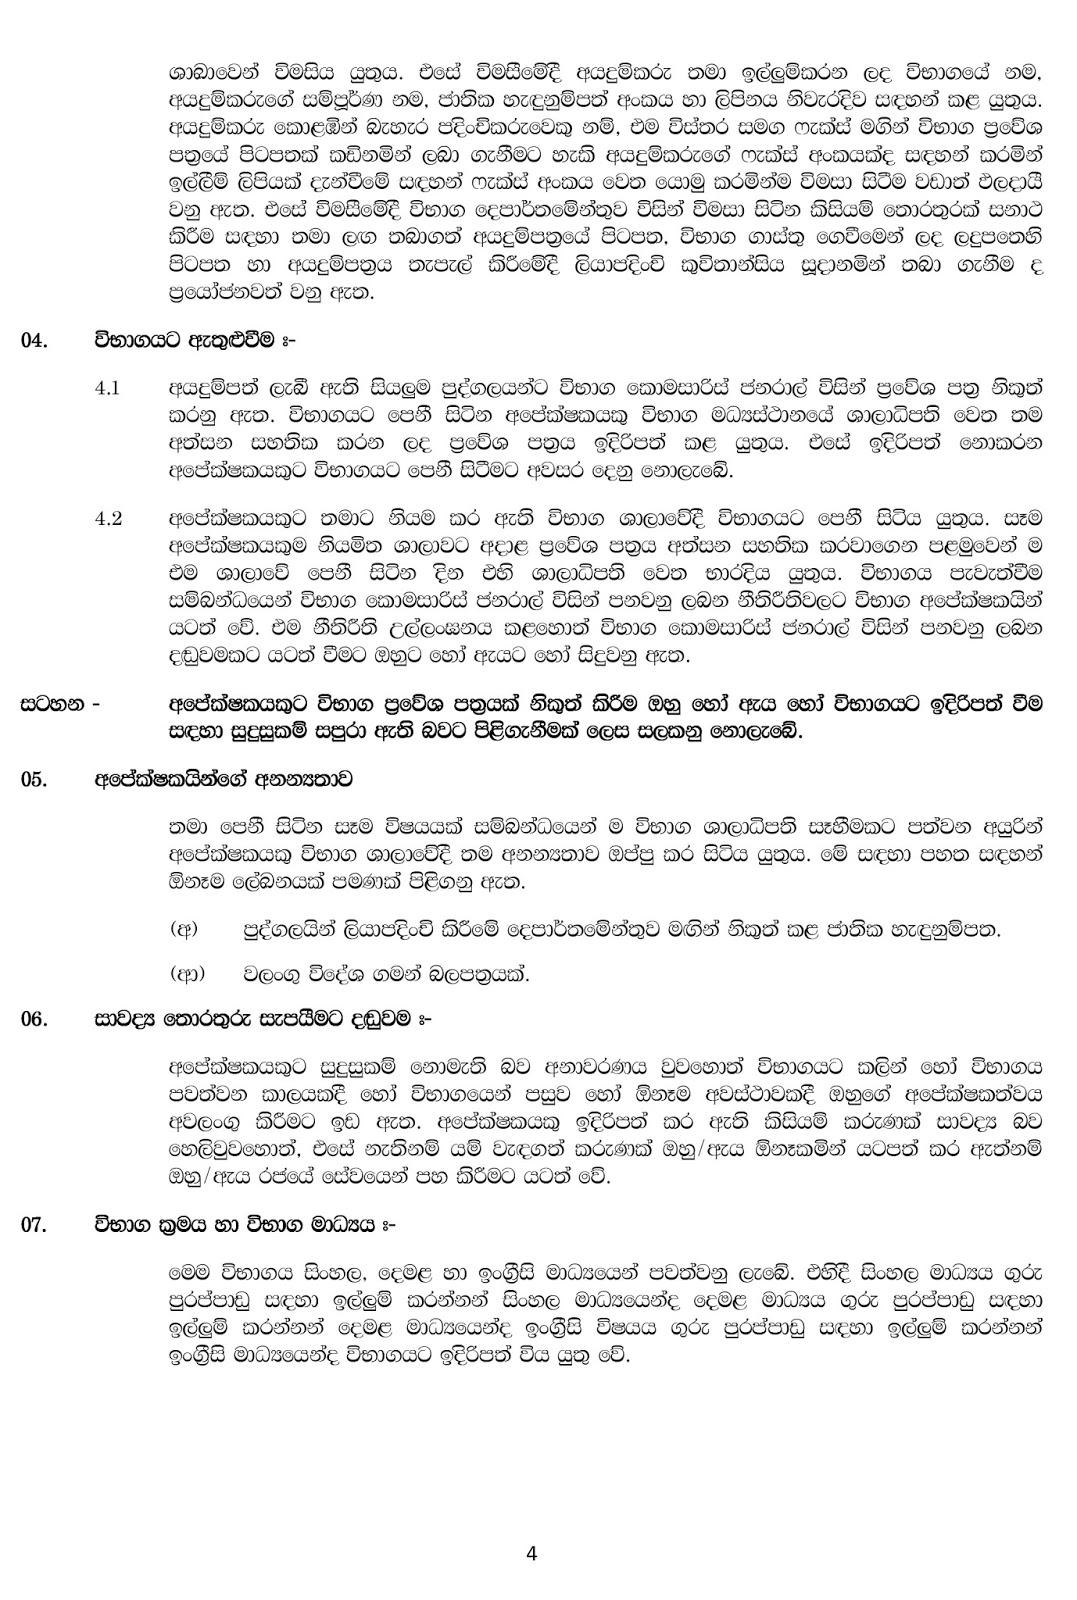 Open Competitive Examination for Sri Lanka Custom Officer Vacancies